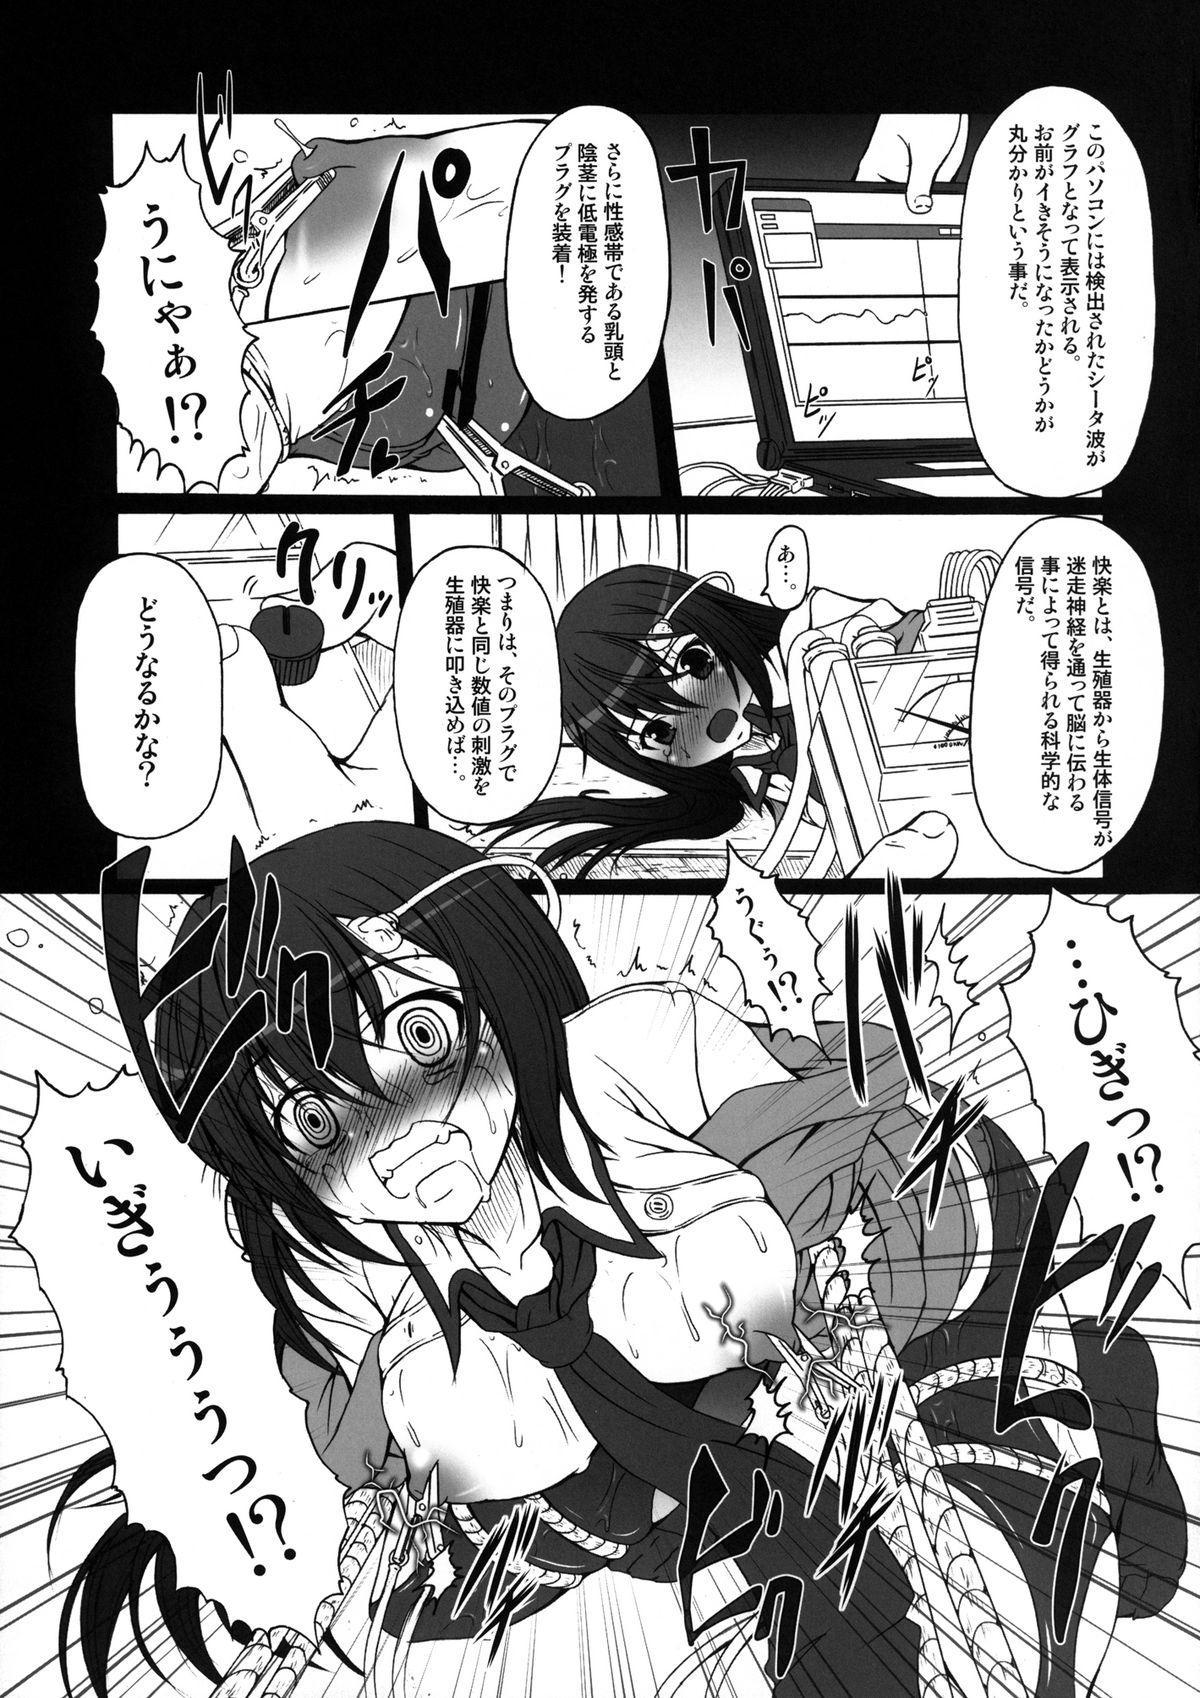 HOBBY'S BLOCK!! 14 Kairaku Tousaku no Ecstasy 12